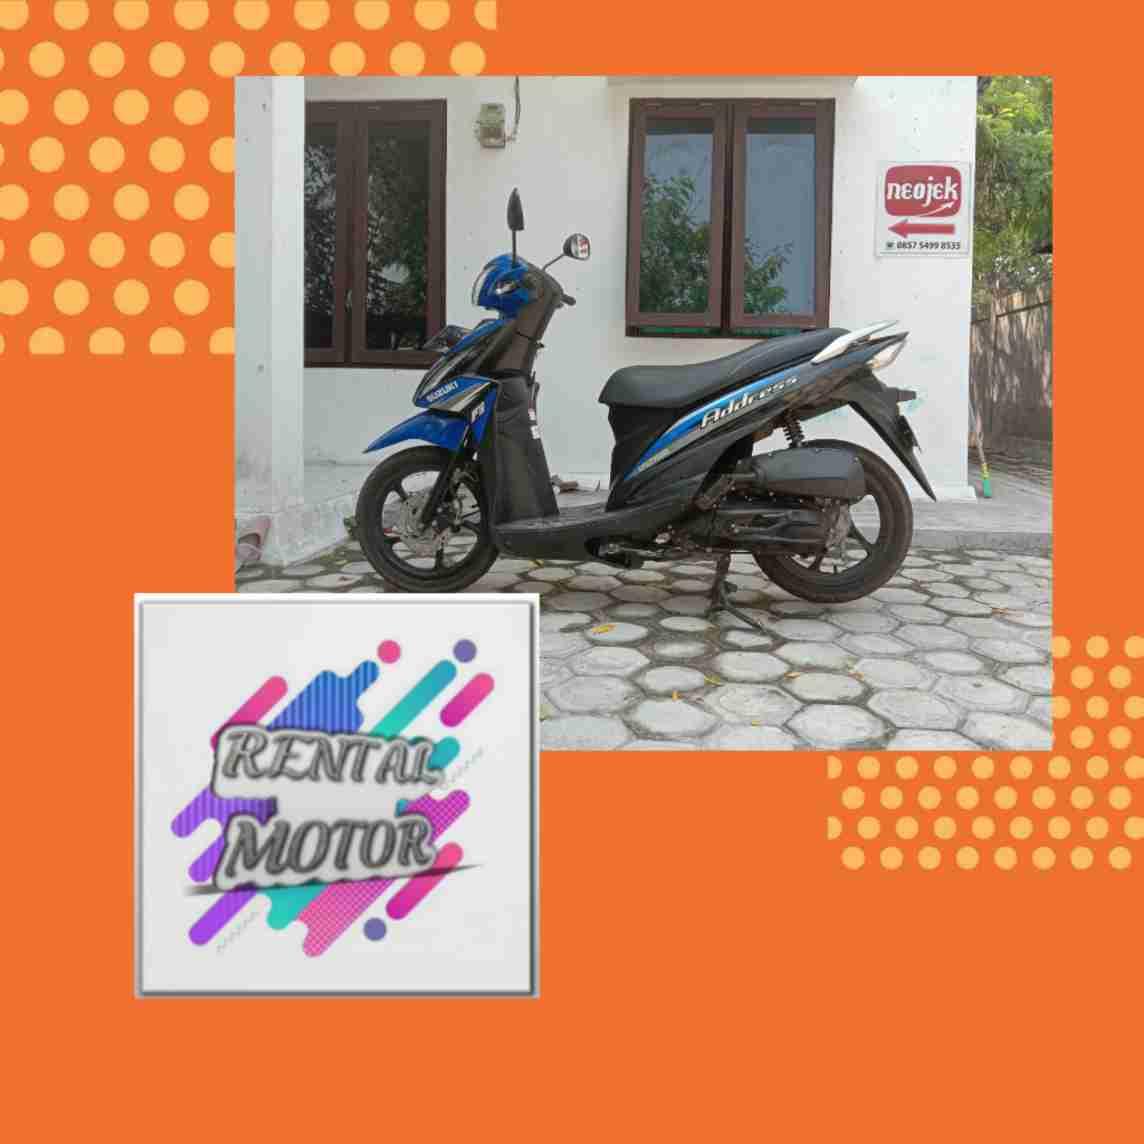 rental motor Neojek Palangkaraya